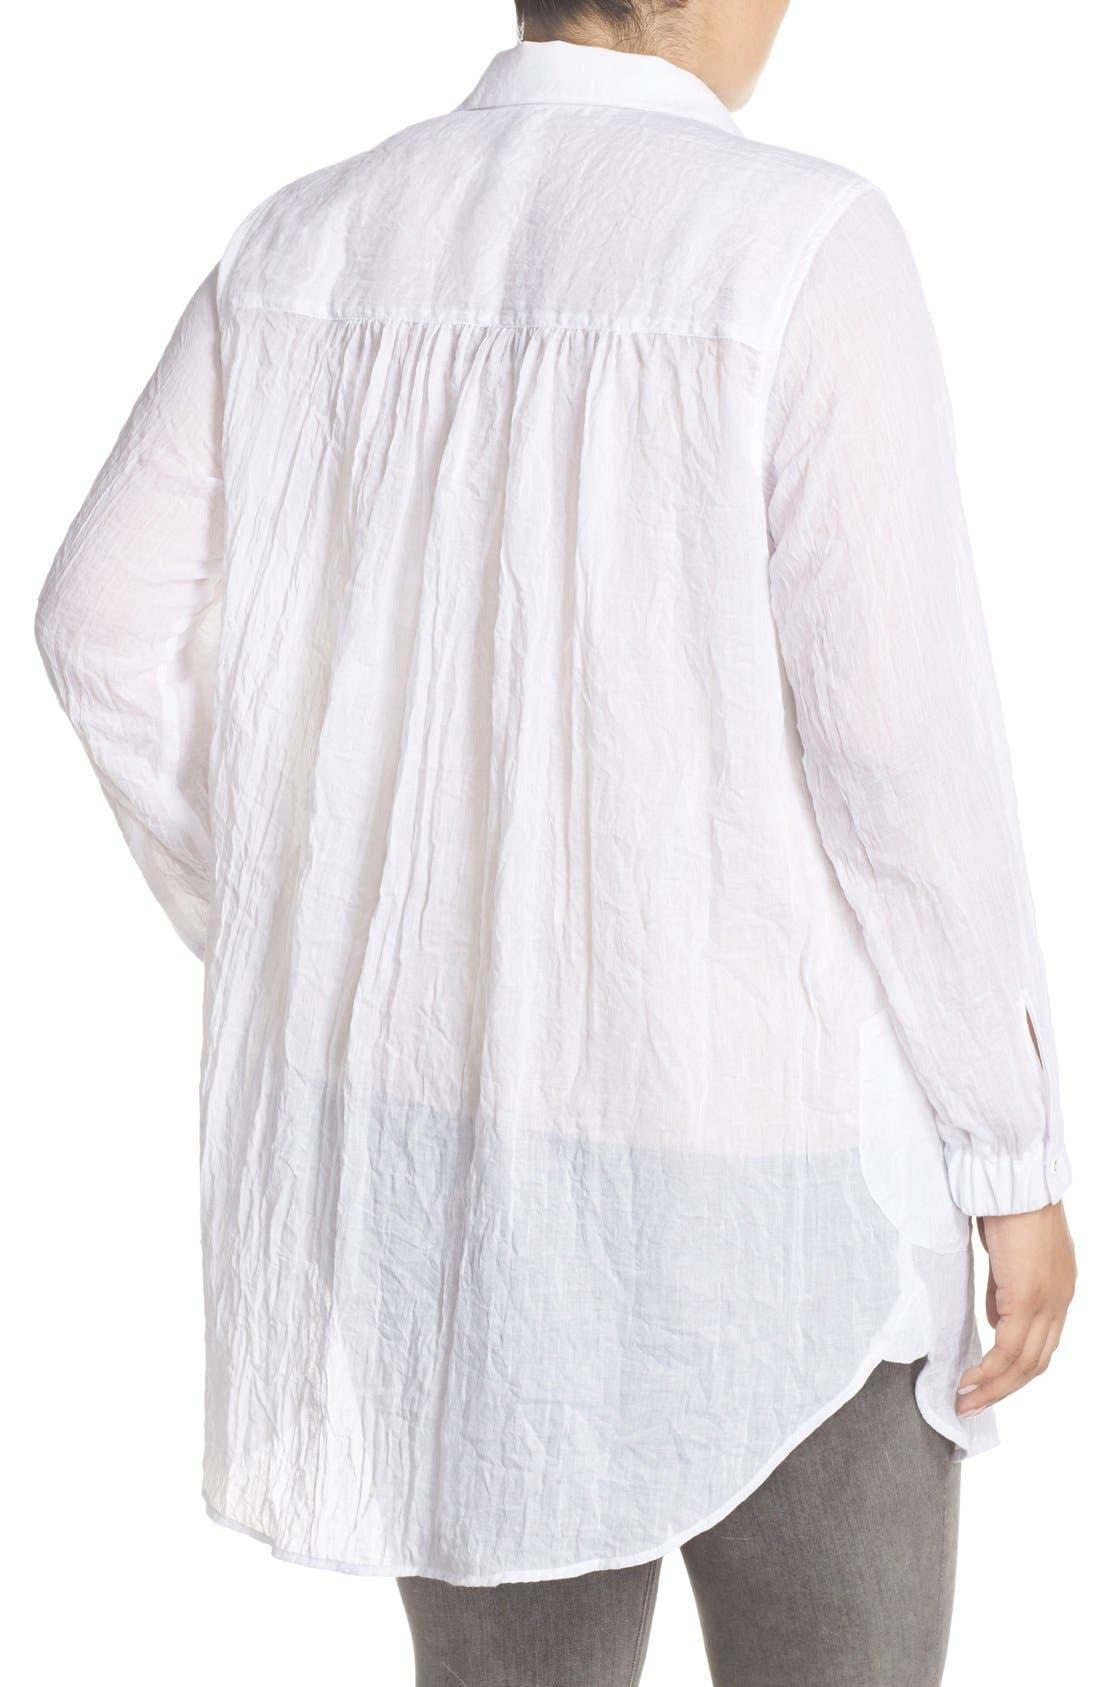 Alternate Image 2  - Melissa McCarthy Seven7 Patch Pocket Tunic Shirt (Plus Size)